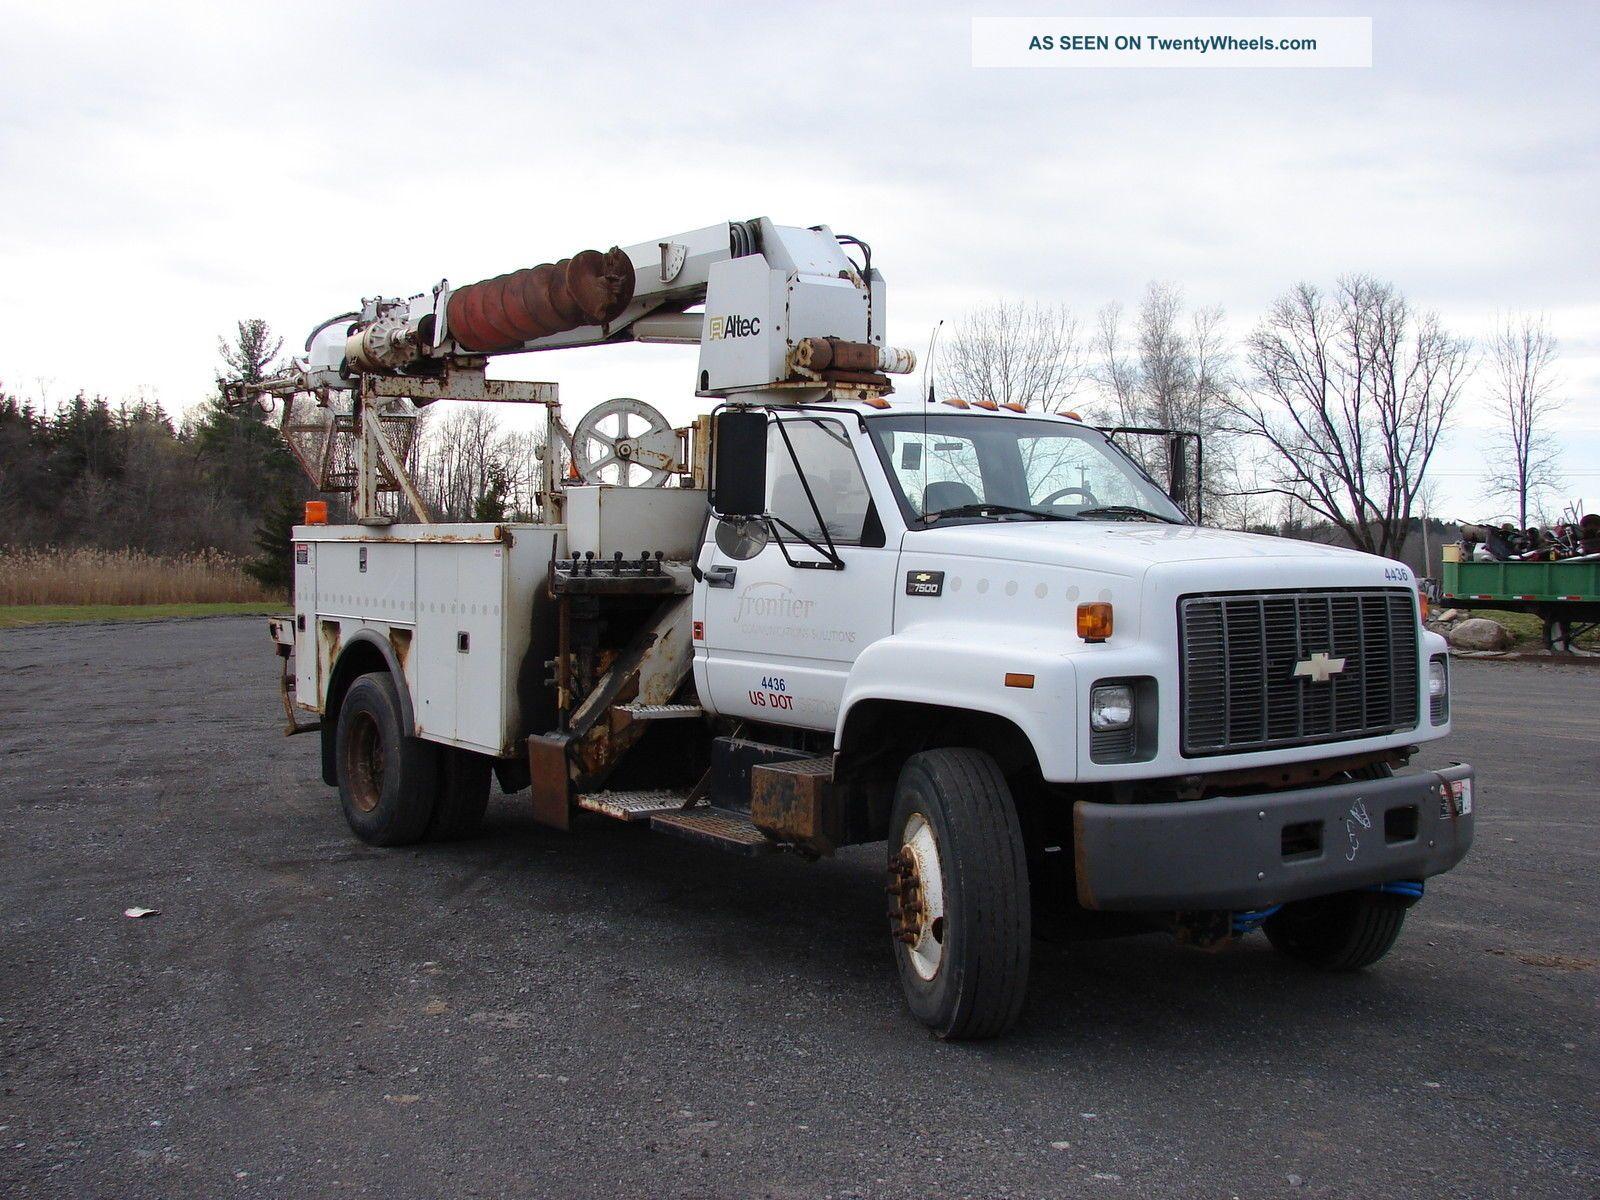 2002 Chevrolet C - 7500 Bucket / Boom Trucks photo